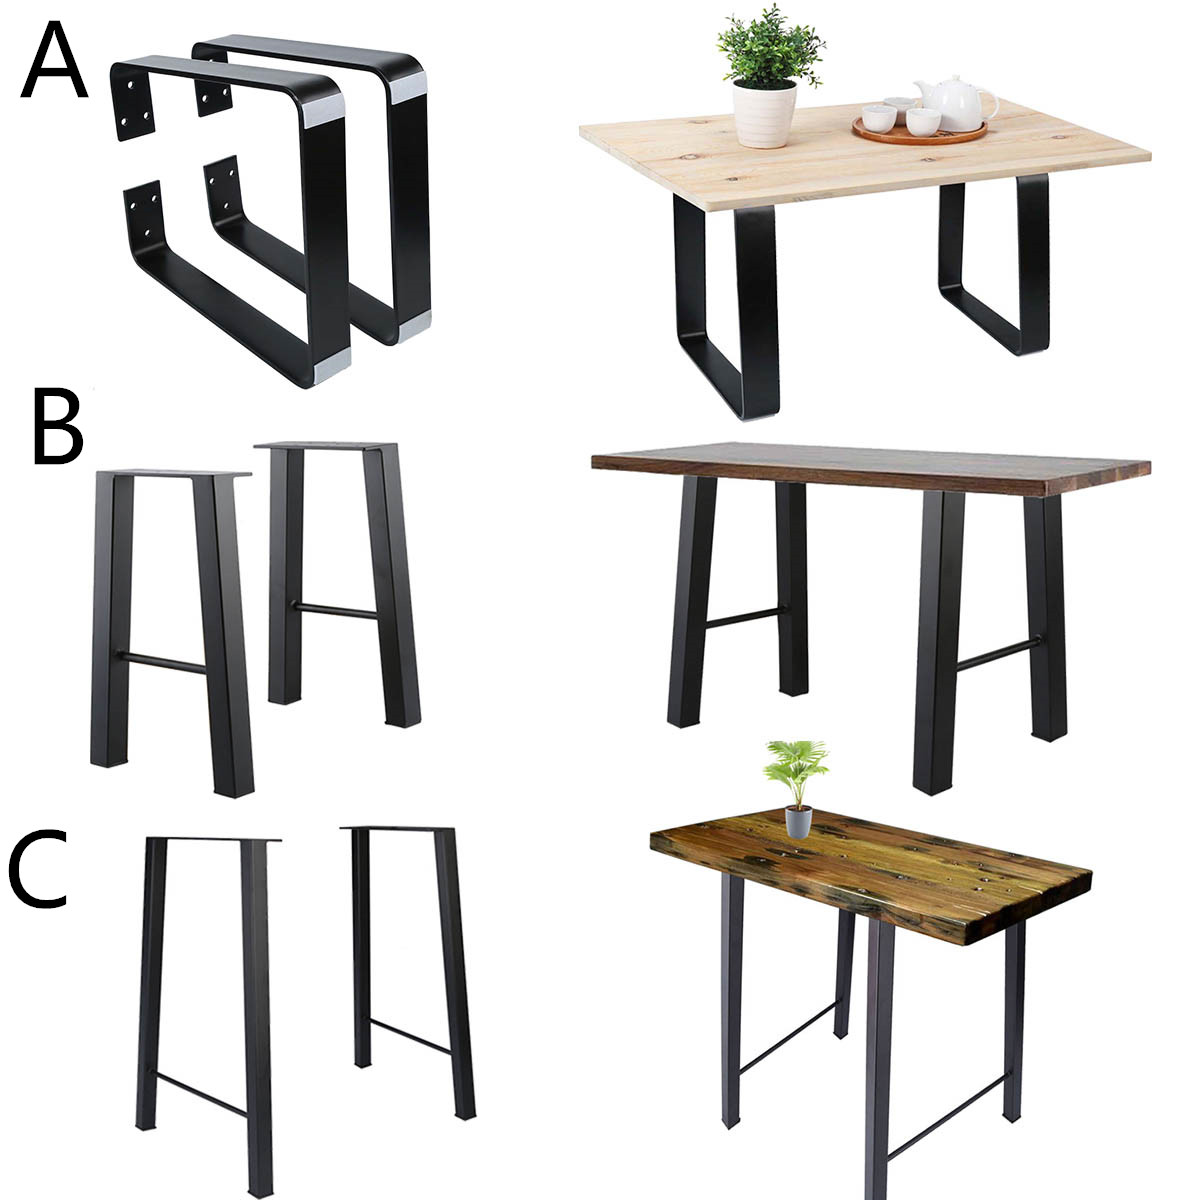 Details About Three Model Vintage Styles 16 28 Metal Bar Coffee Table Desk Legs Diy Furniture